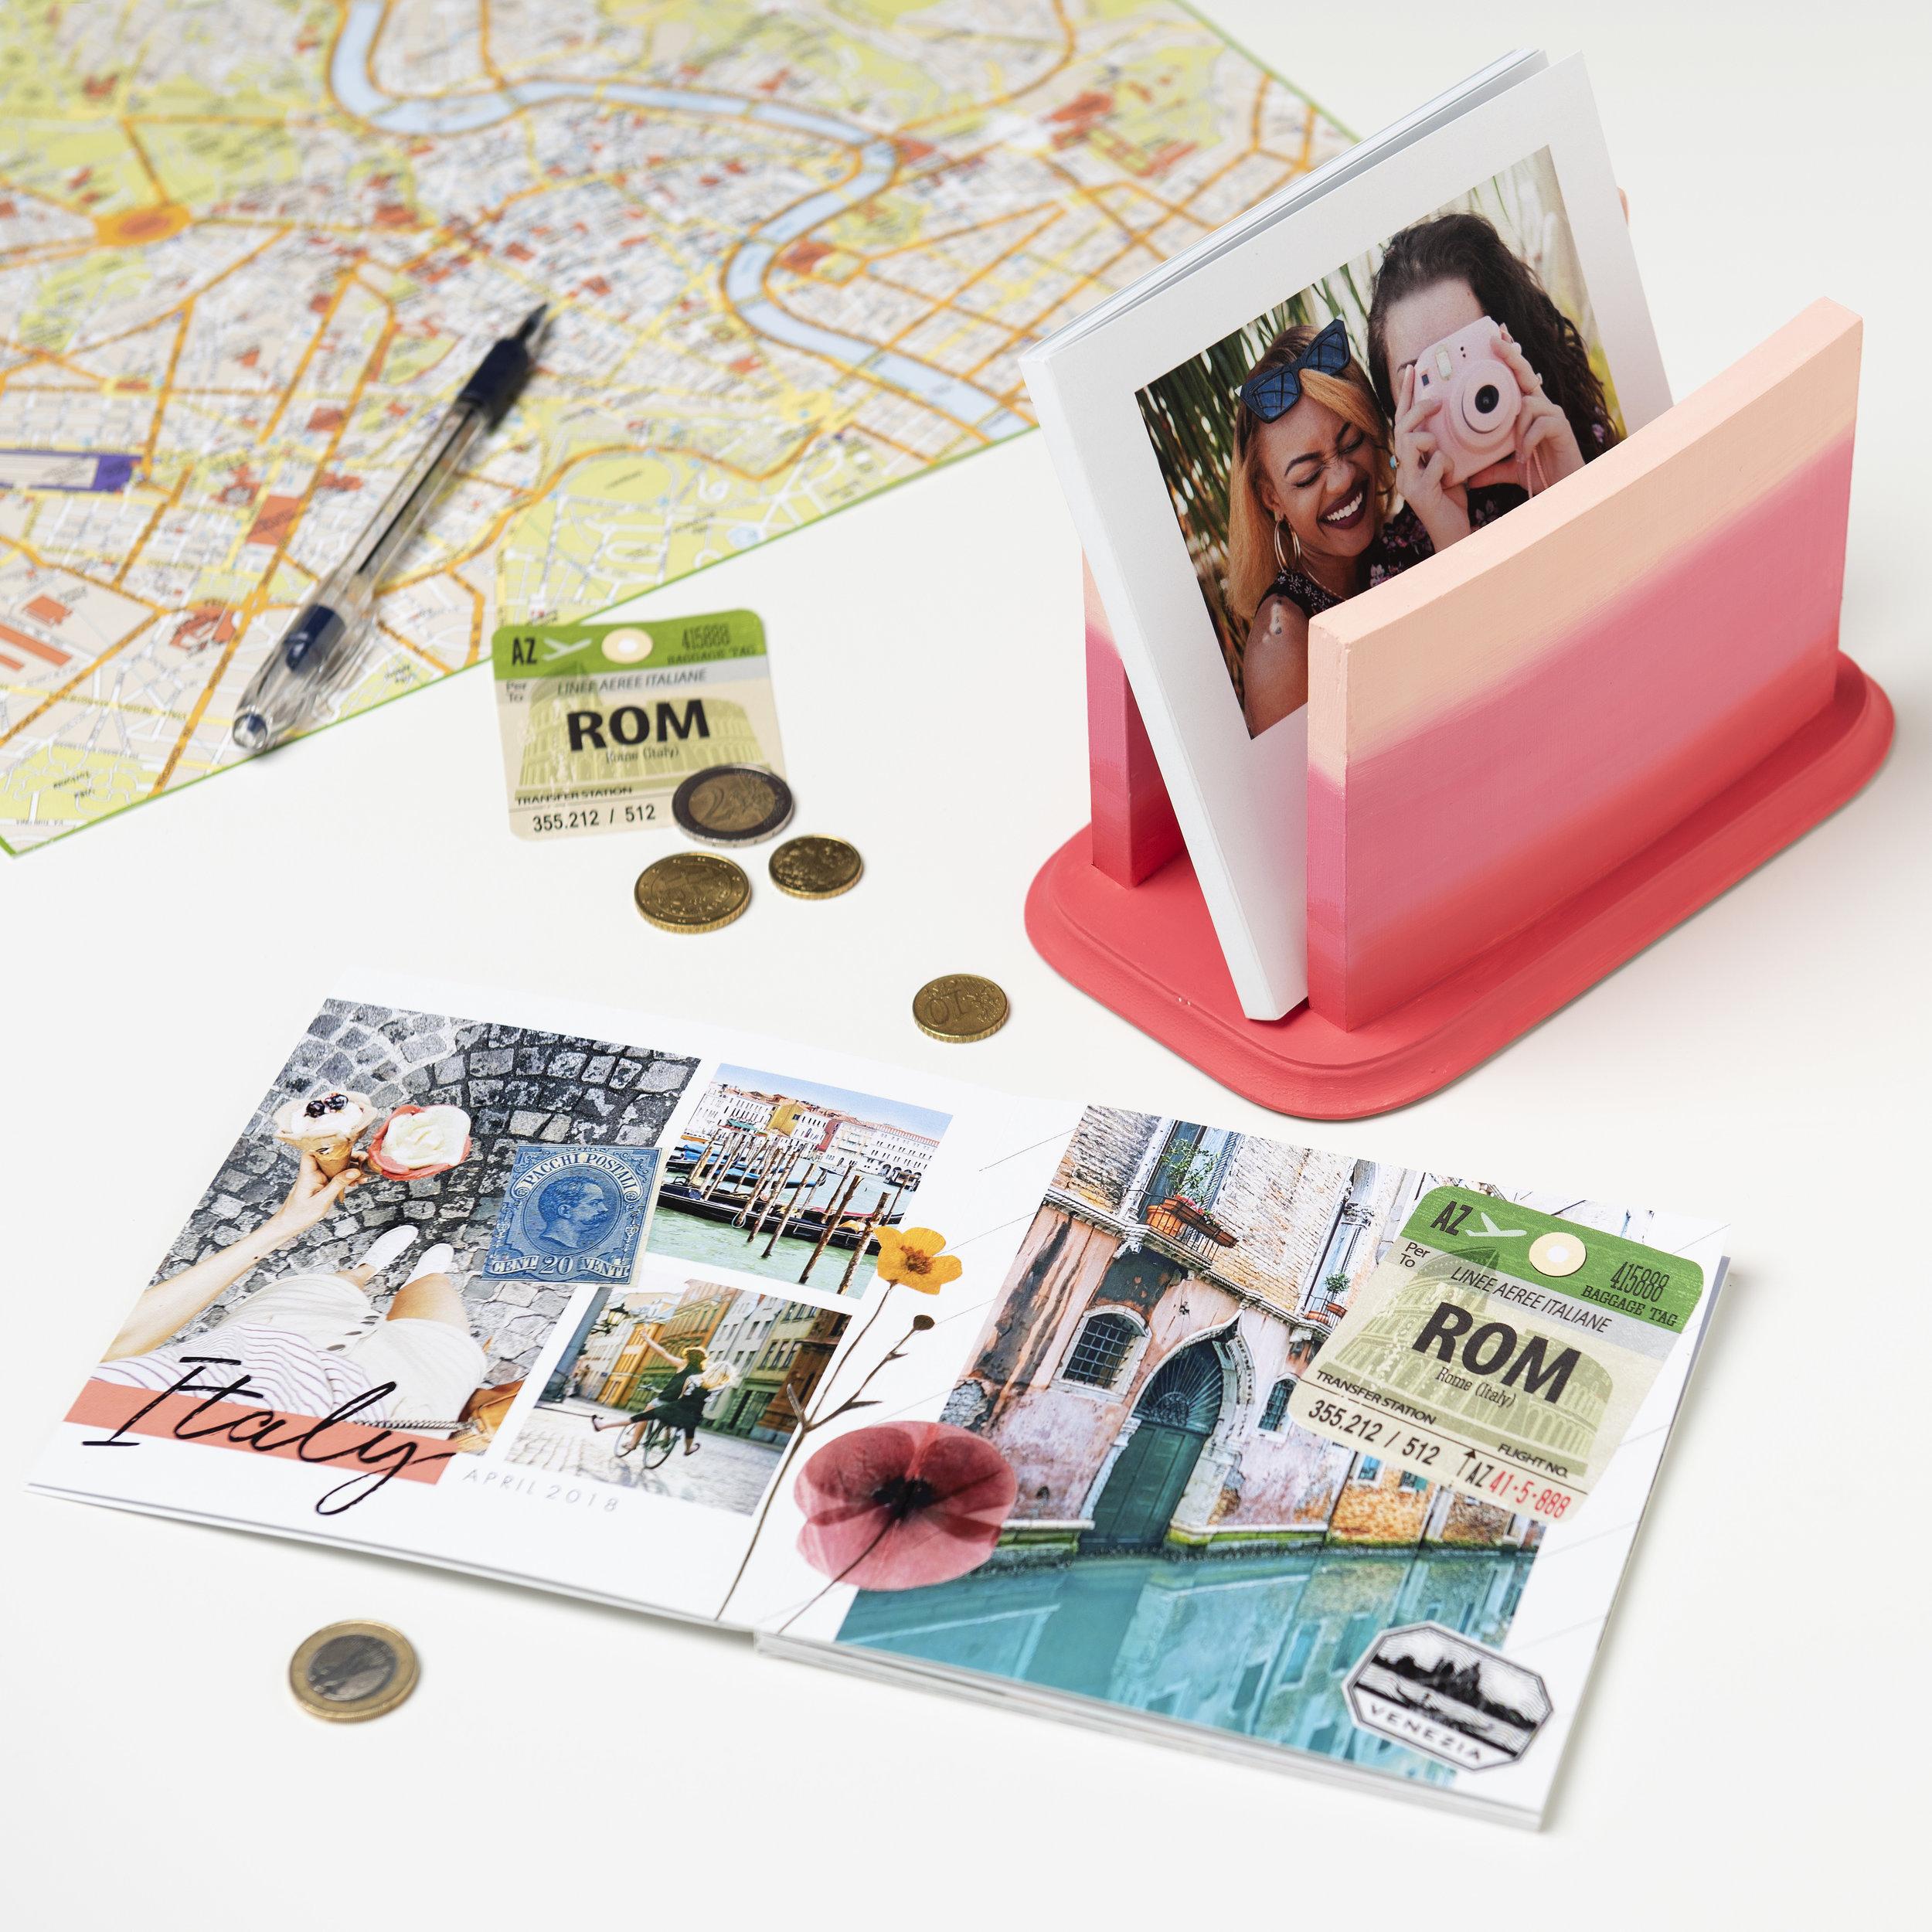 travel-photo-book-mixbook-plaid-crafts-diy-5.jpeg